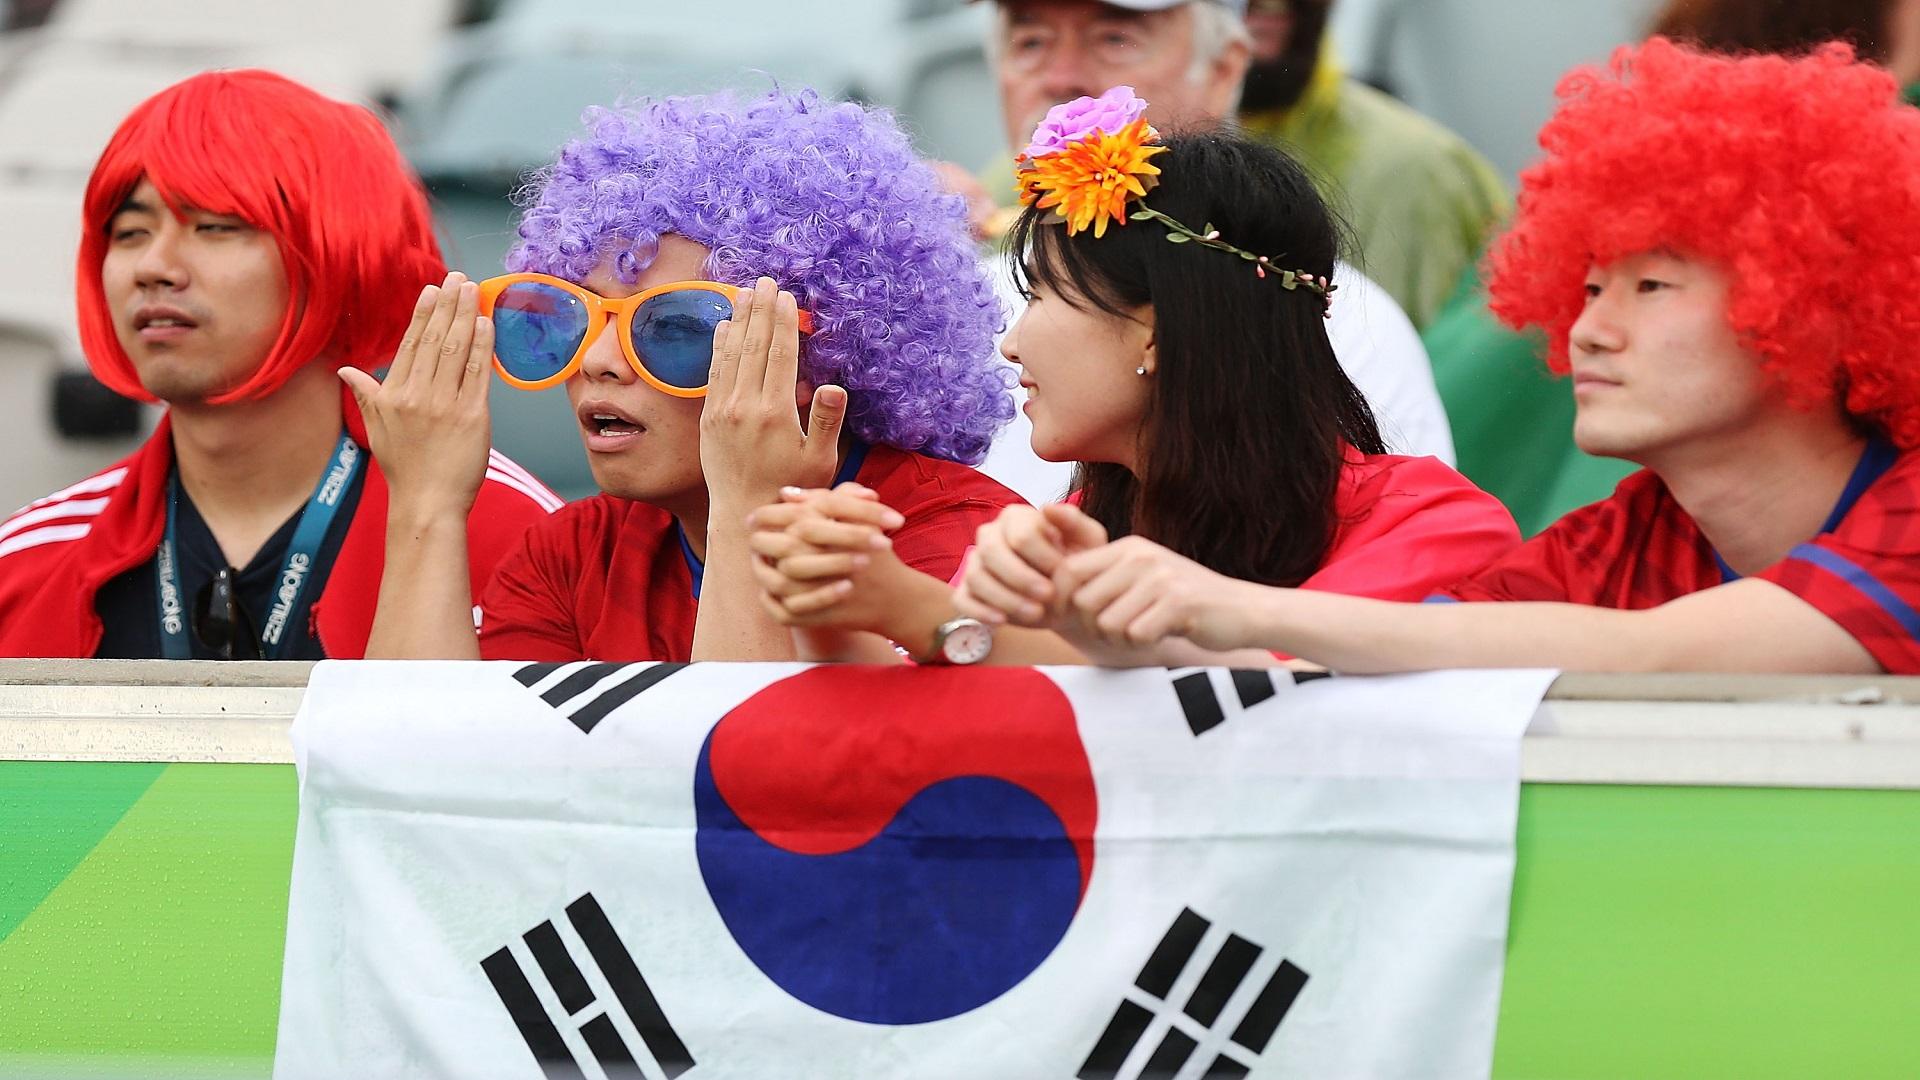 south-korea-fans-151301_16wltg9wq4lst10qpog671ene8.jpg